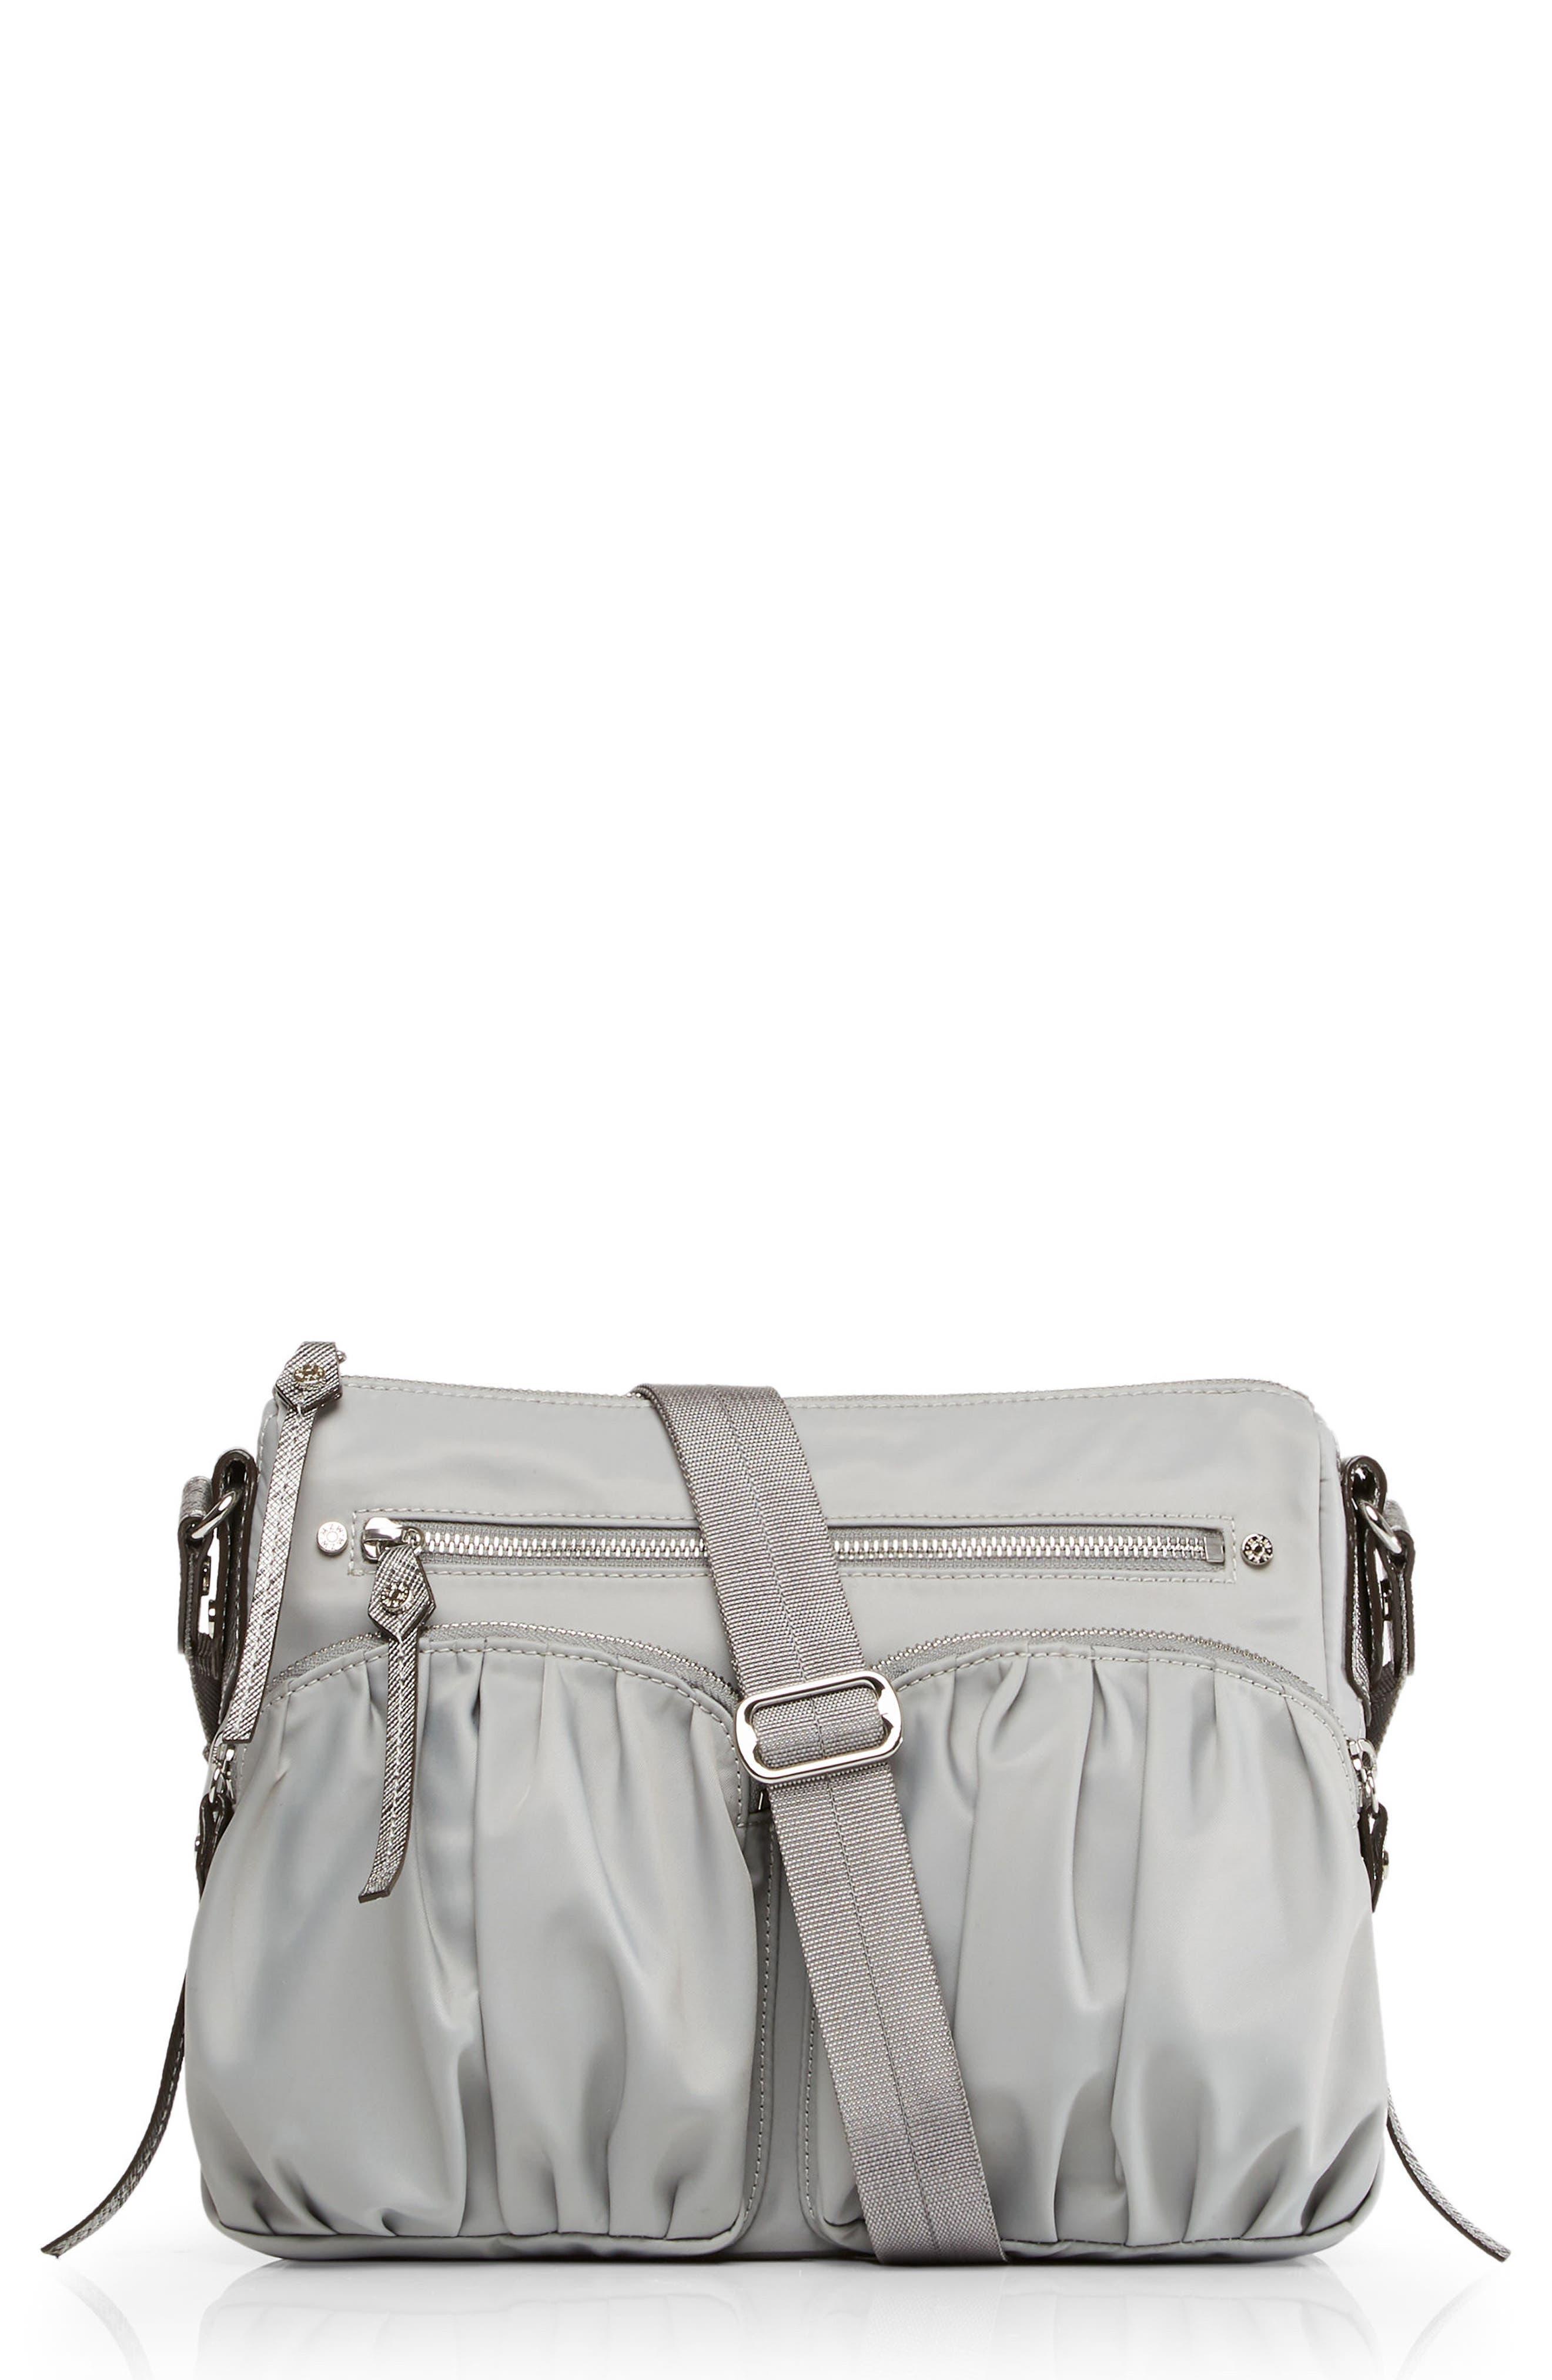 Paige Crossbody Bag,                         Main,                         color, Dove Grey